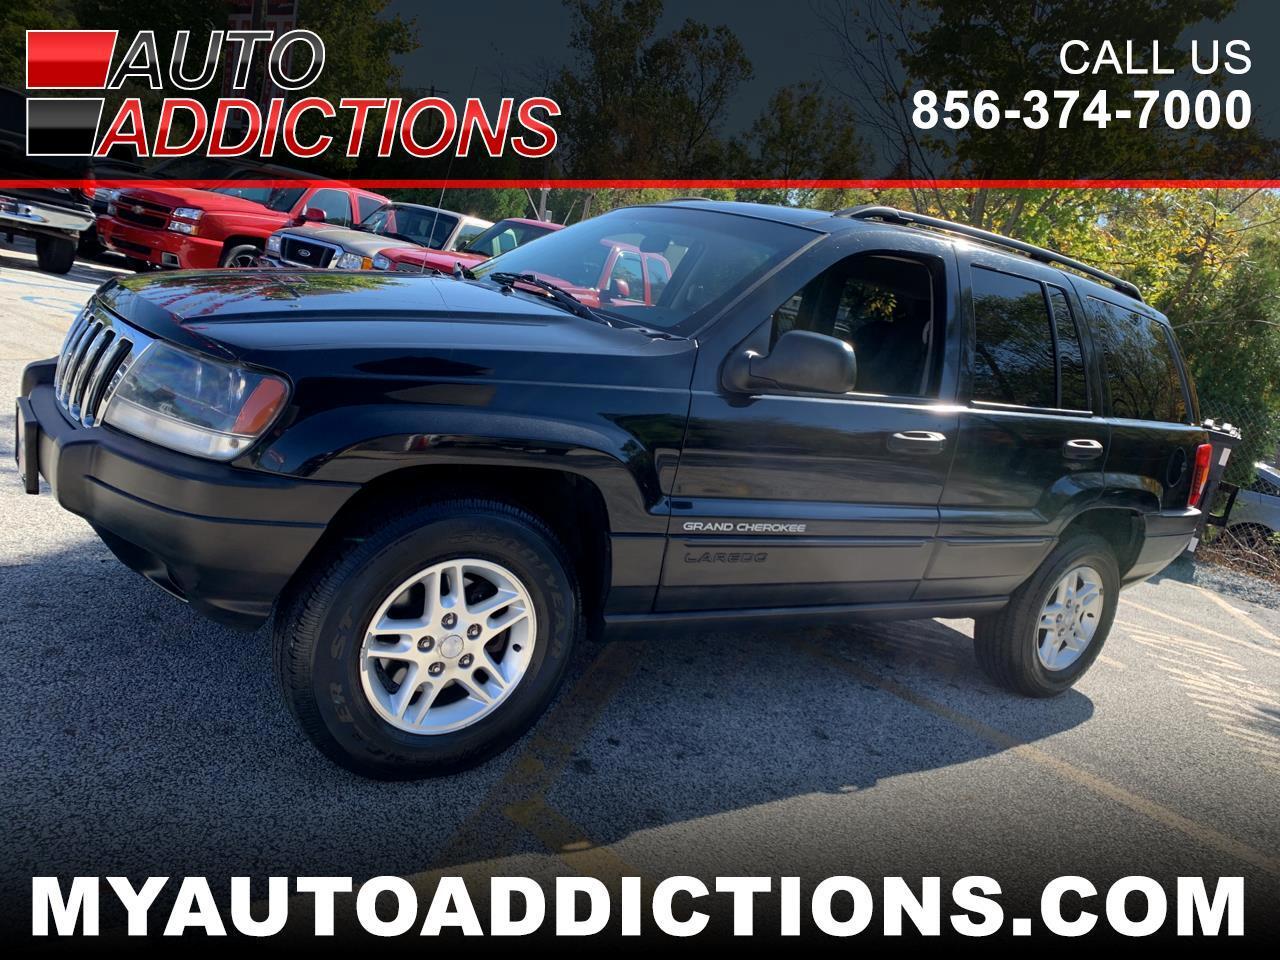 used 2003 jeep grand cherokee laredo 4wd for sale in blackwood nj 08012 auto addictions auto addictions